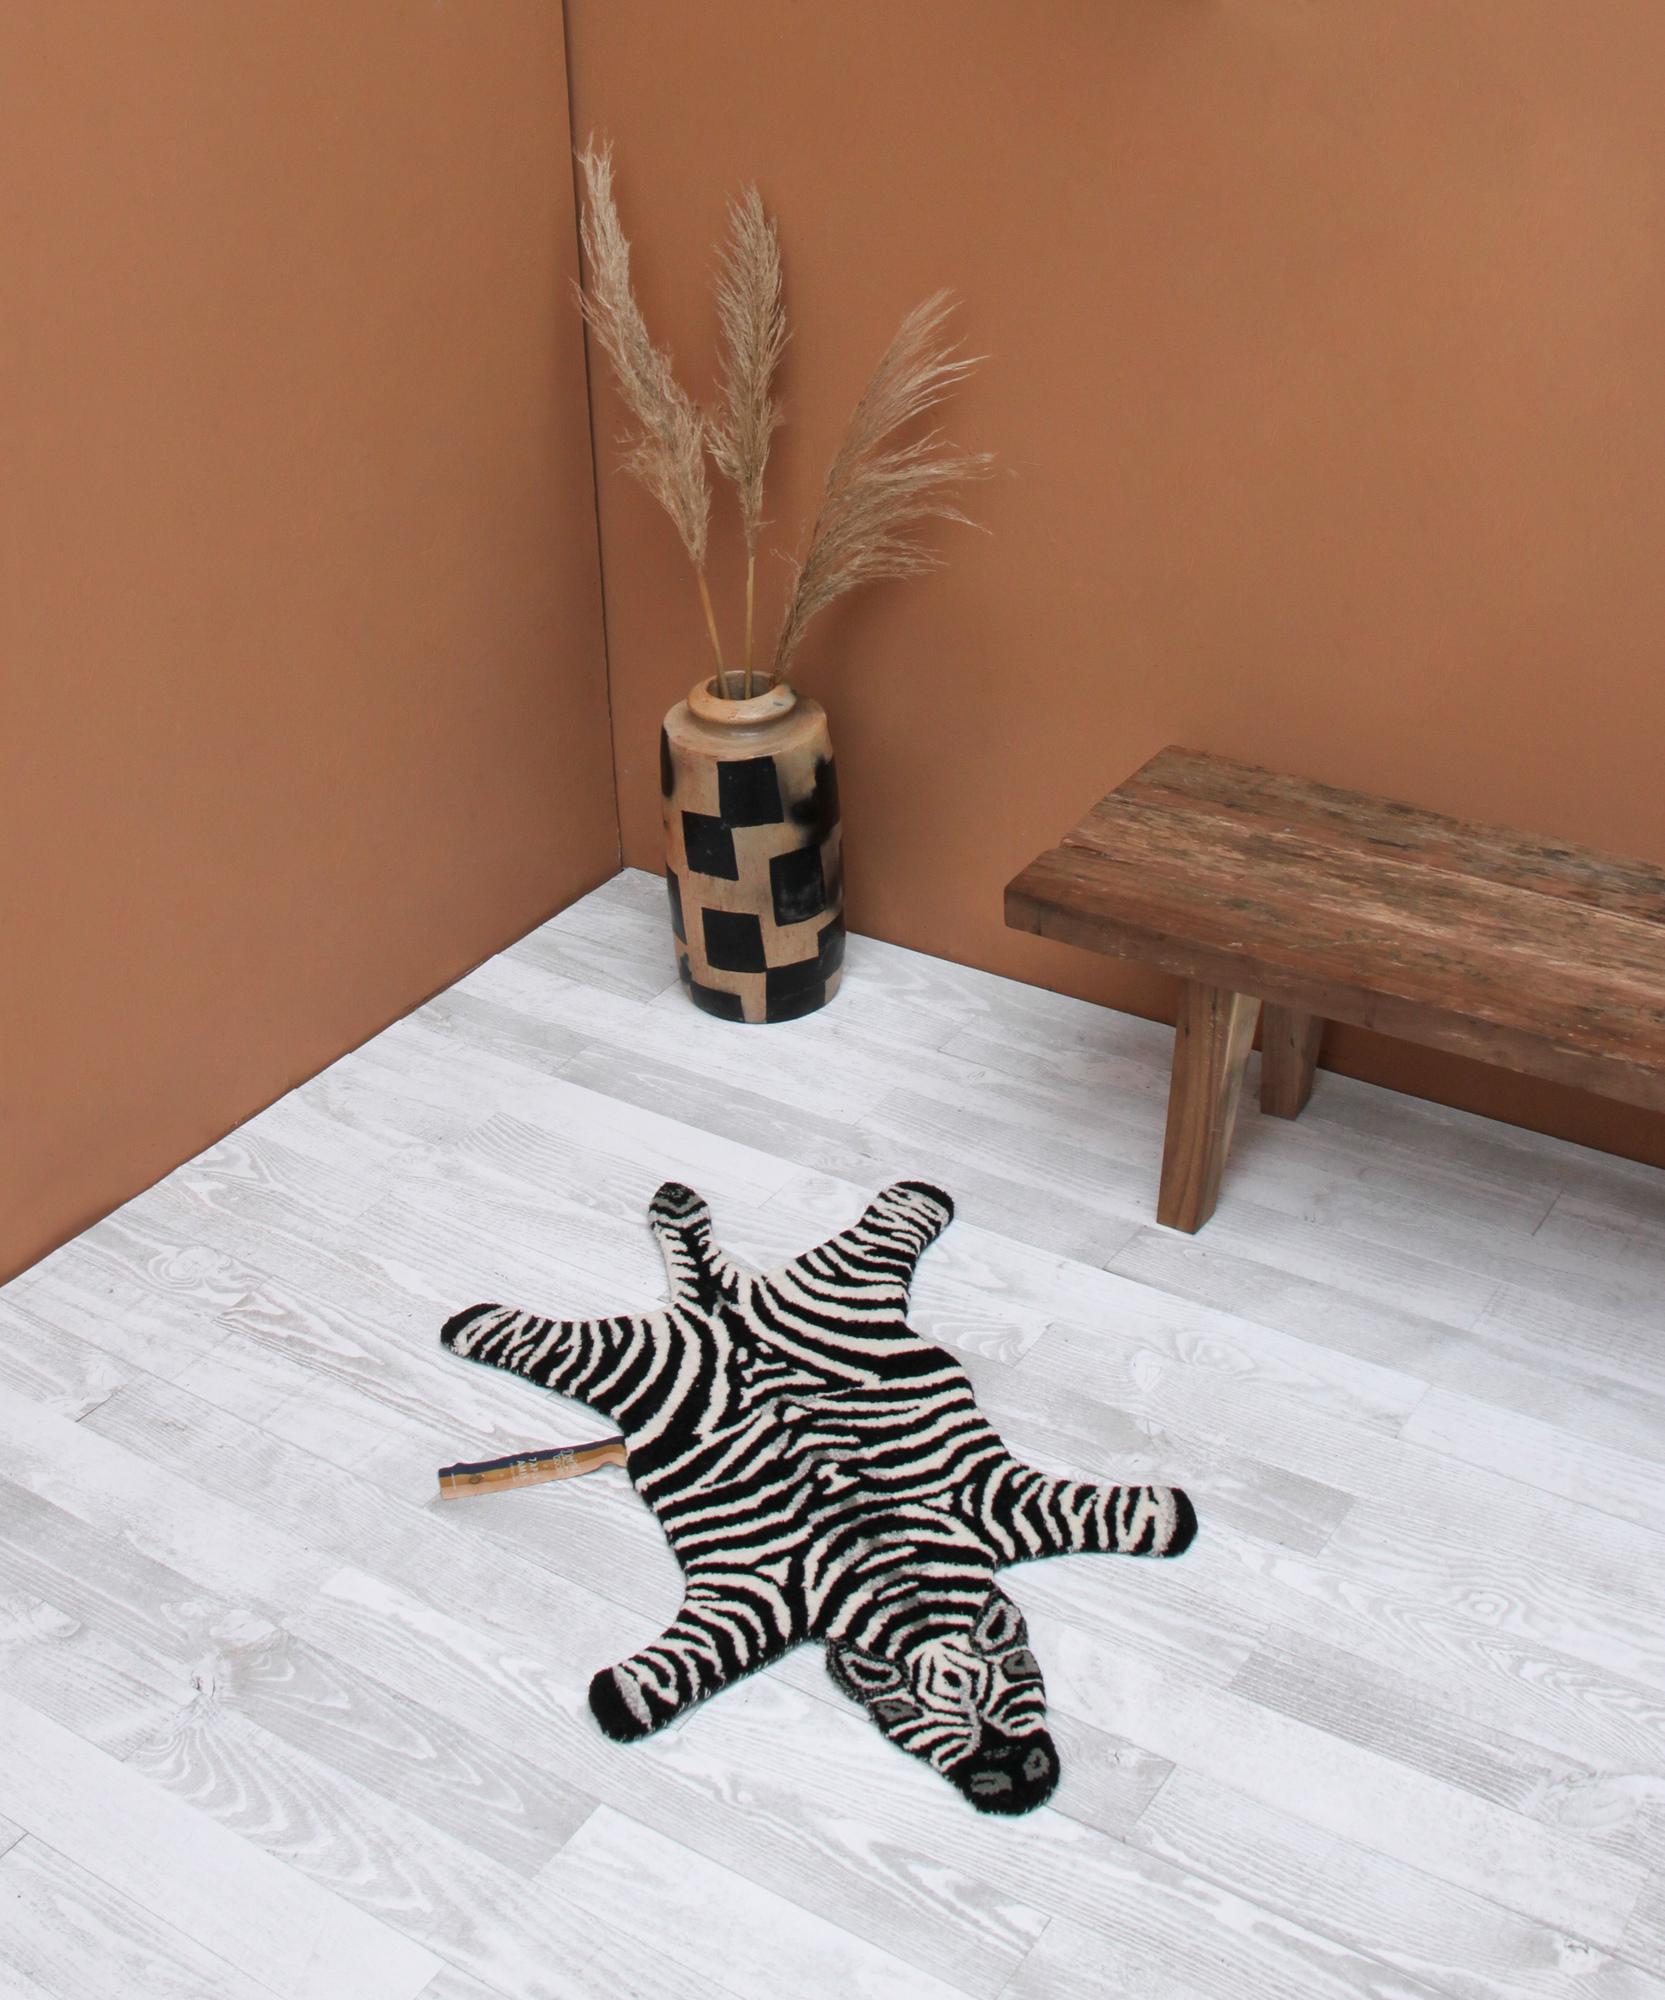 Chubby Zebra Rug Small Doing Goods